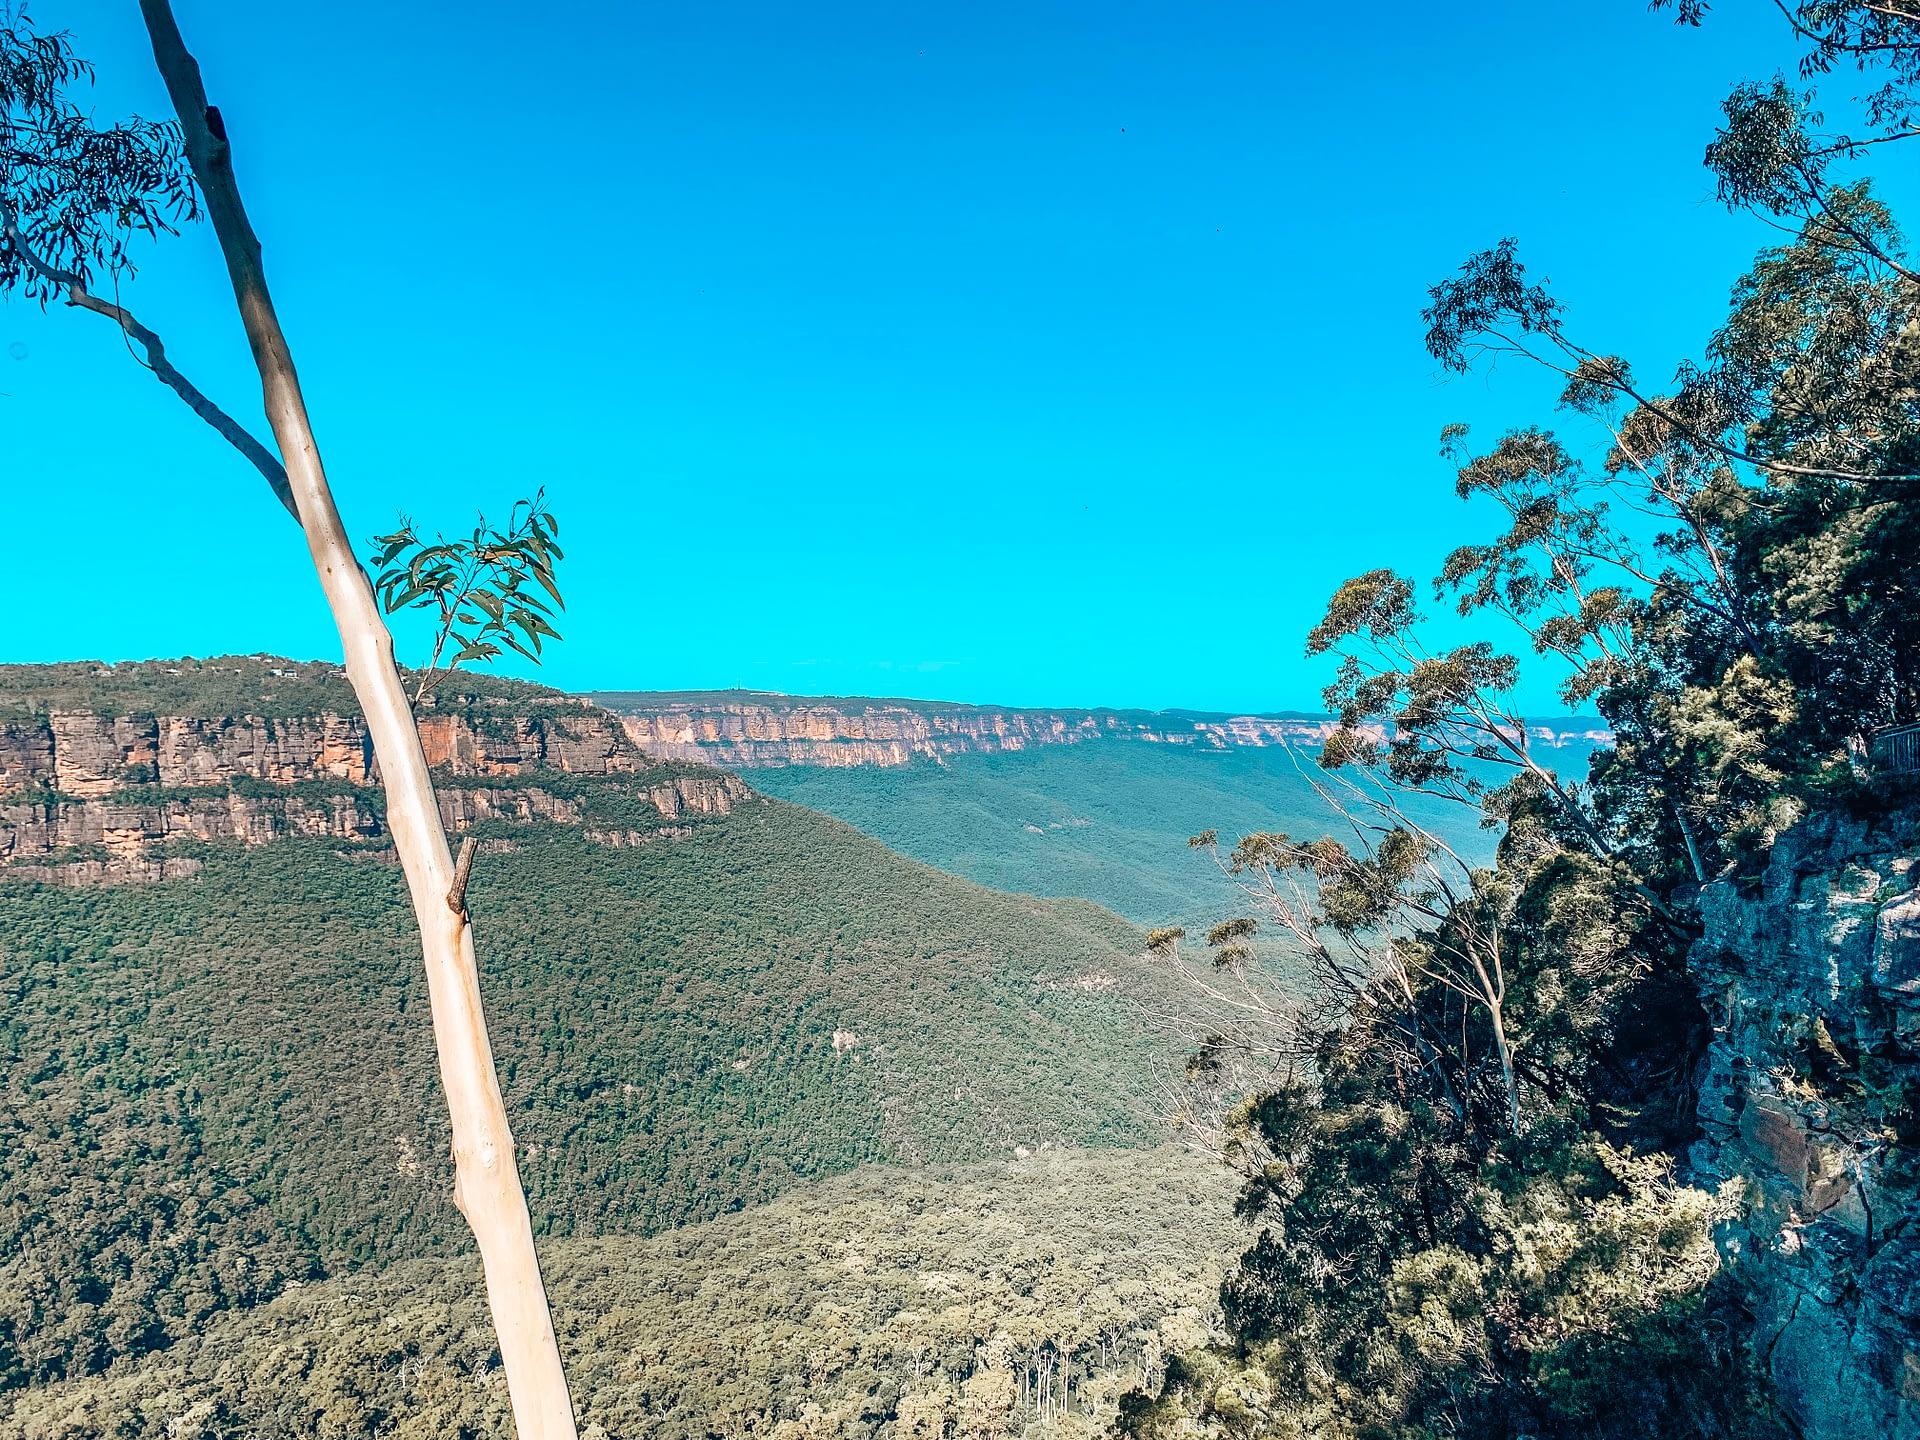 Honeymoon Lookout Blue Mountains